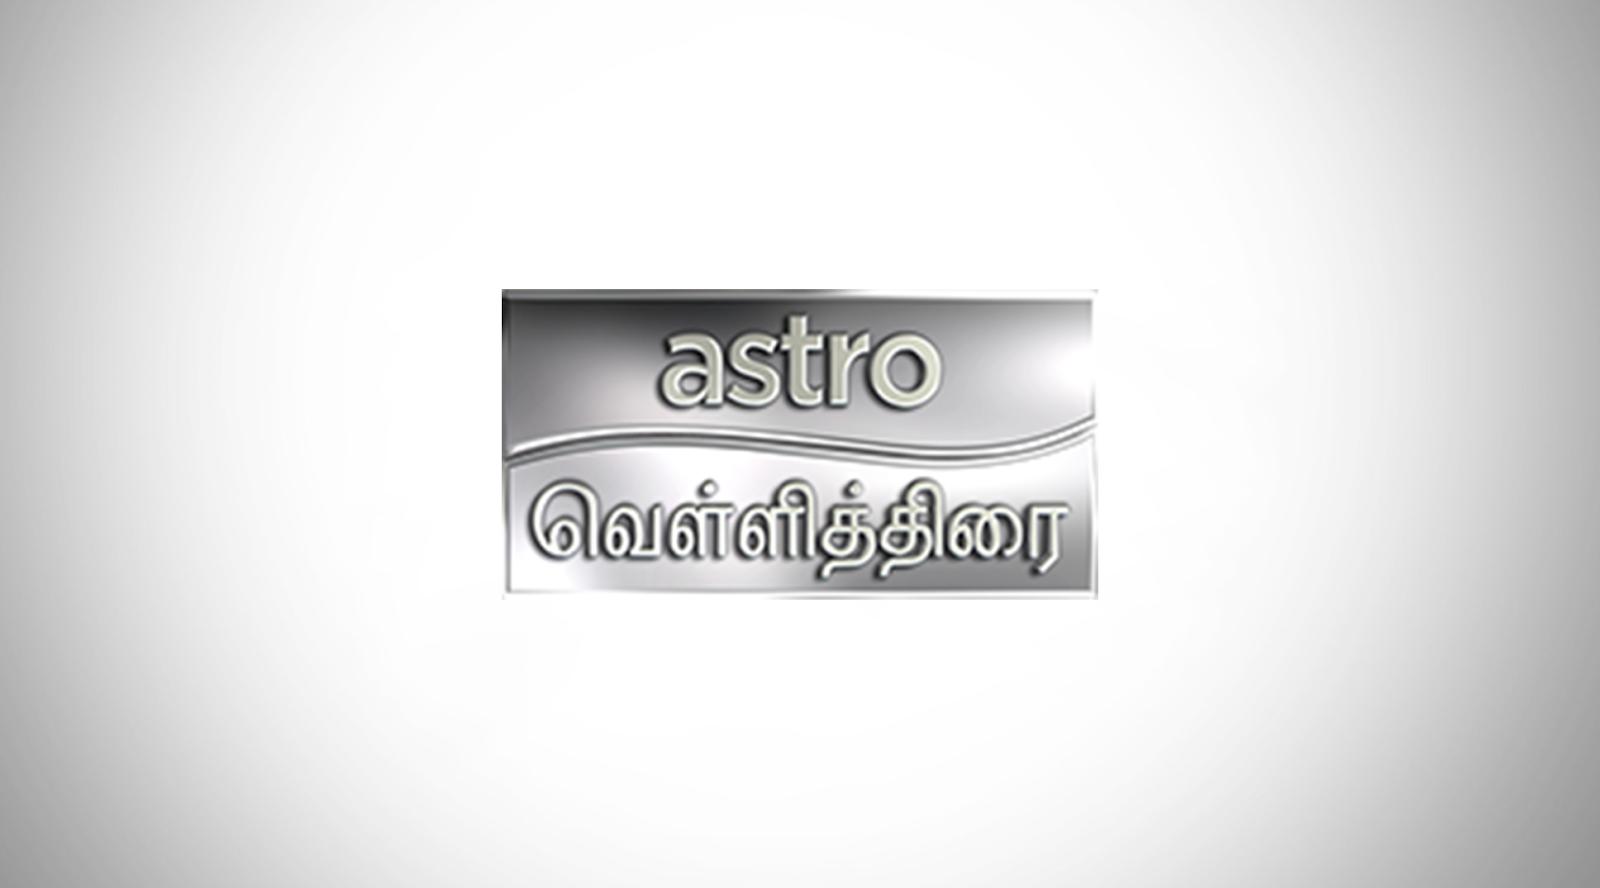 Astro Vellithirai Live Streaming